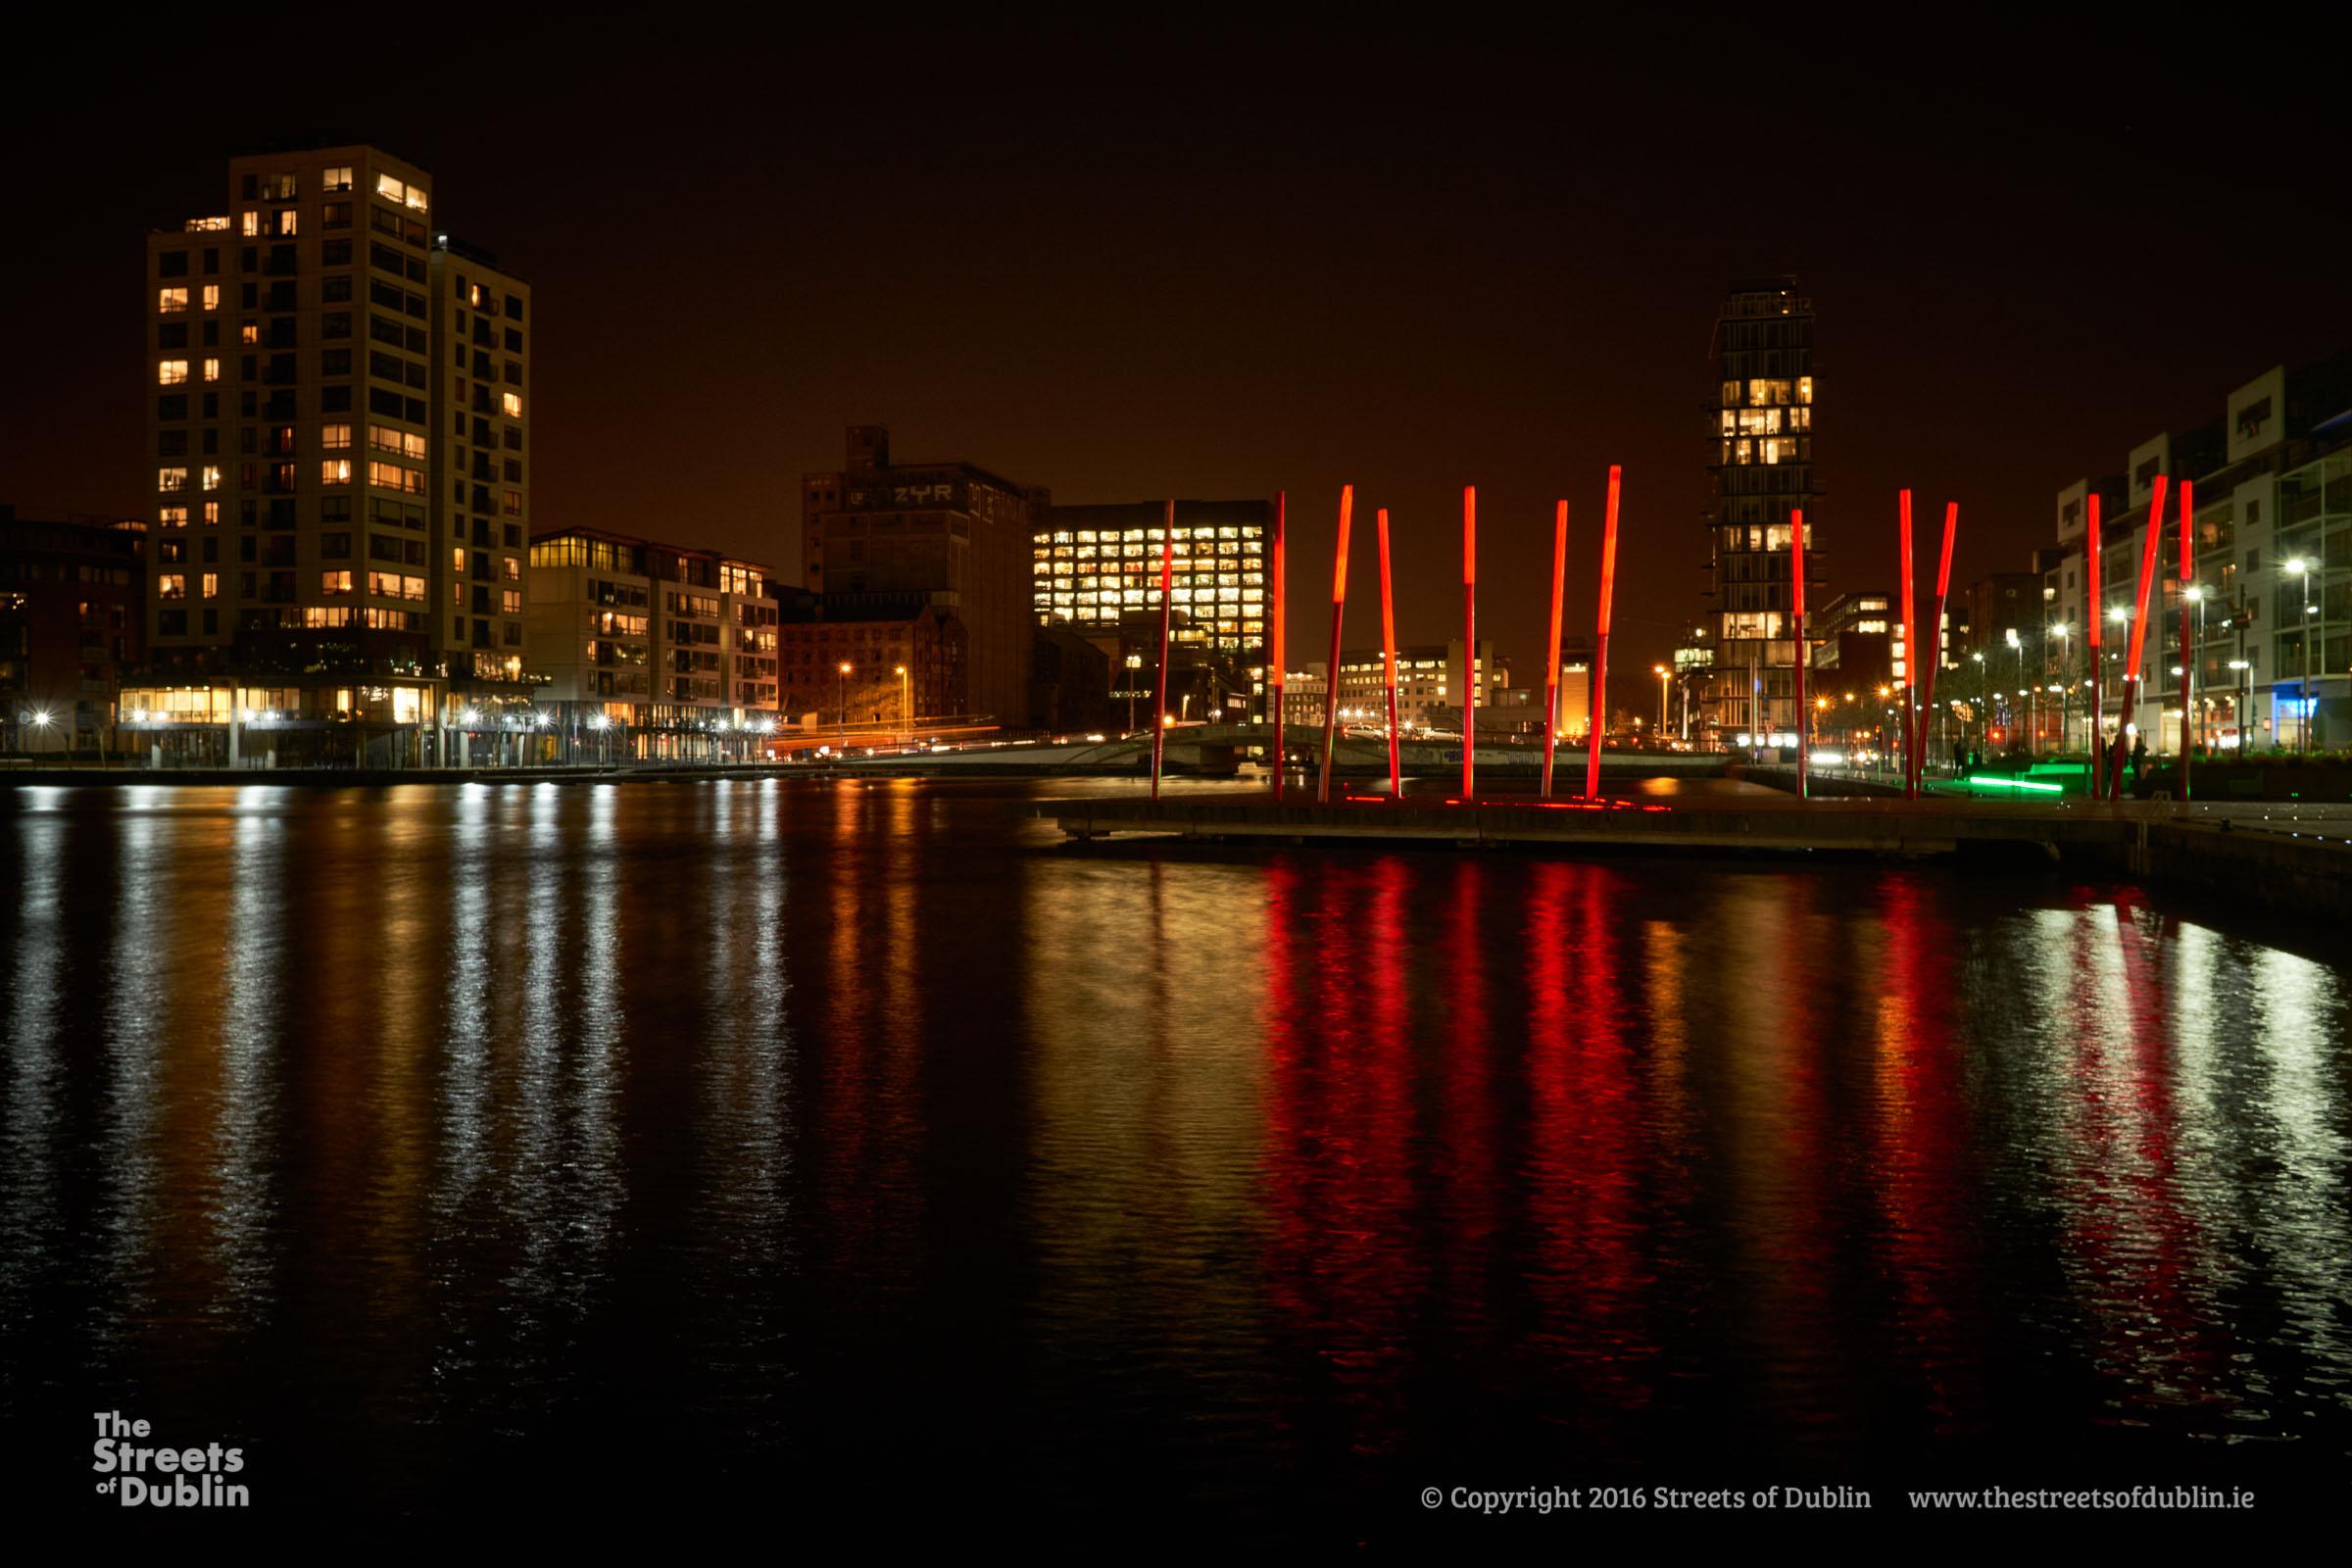 Streets-of-Dublin-Photo-14.jpg